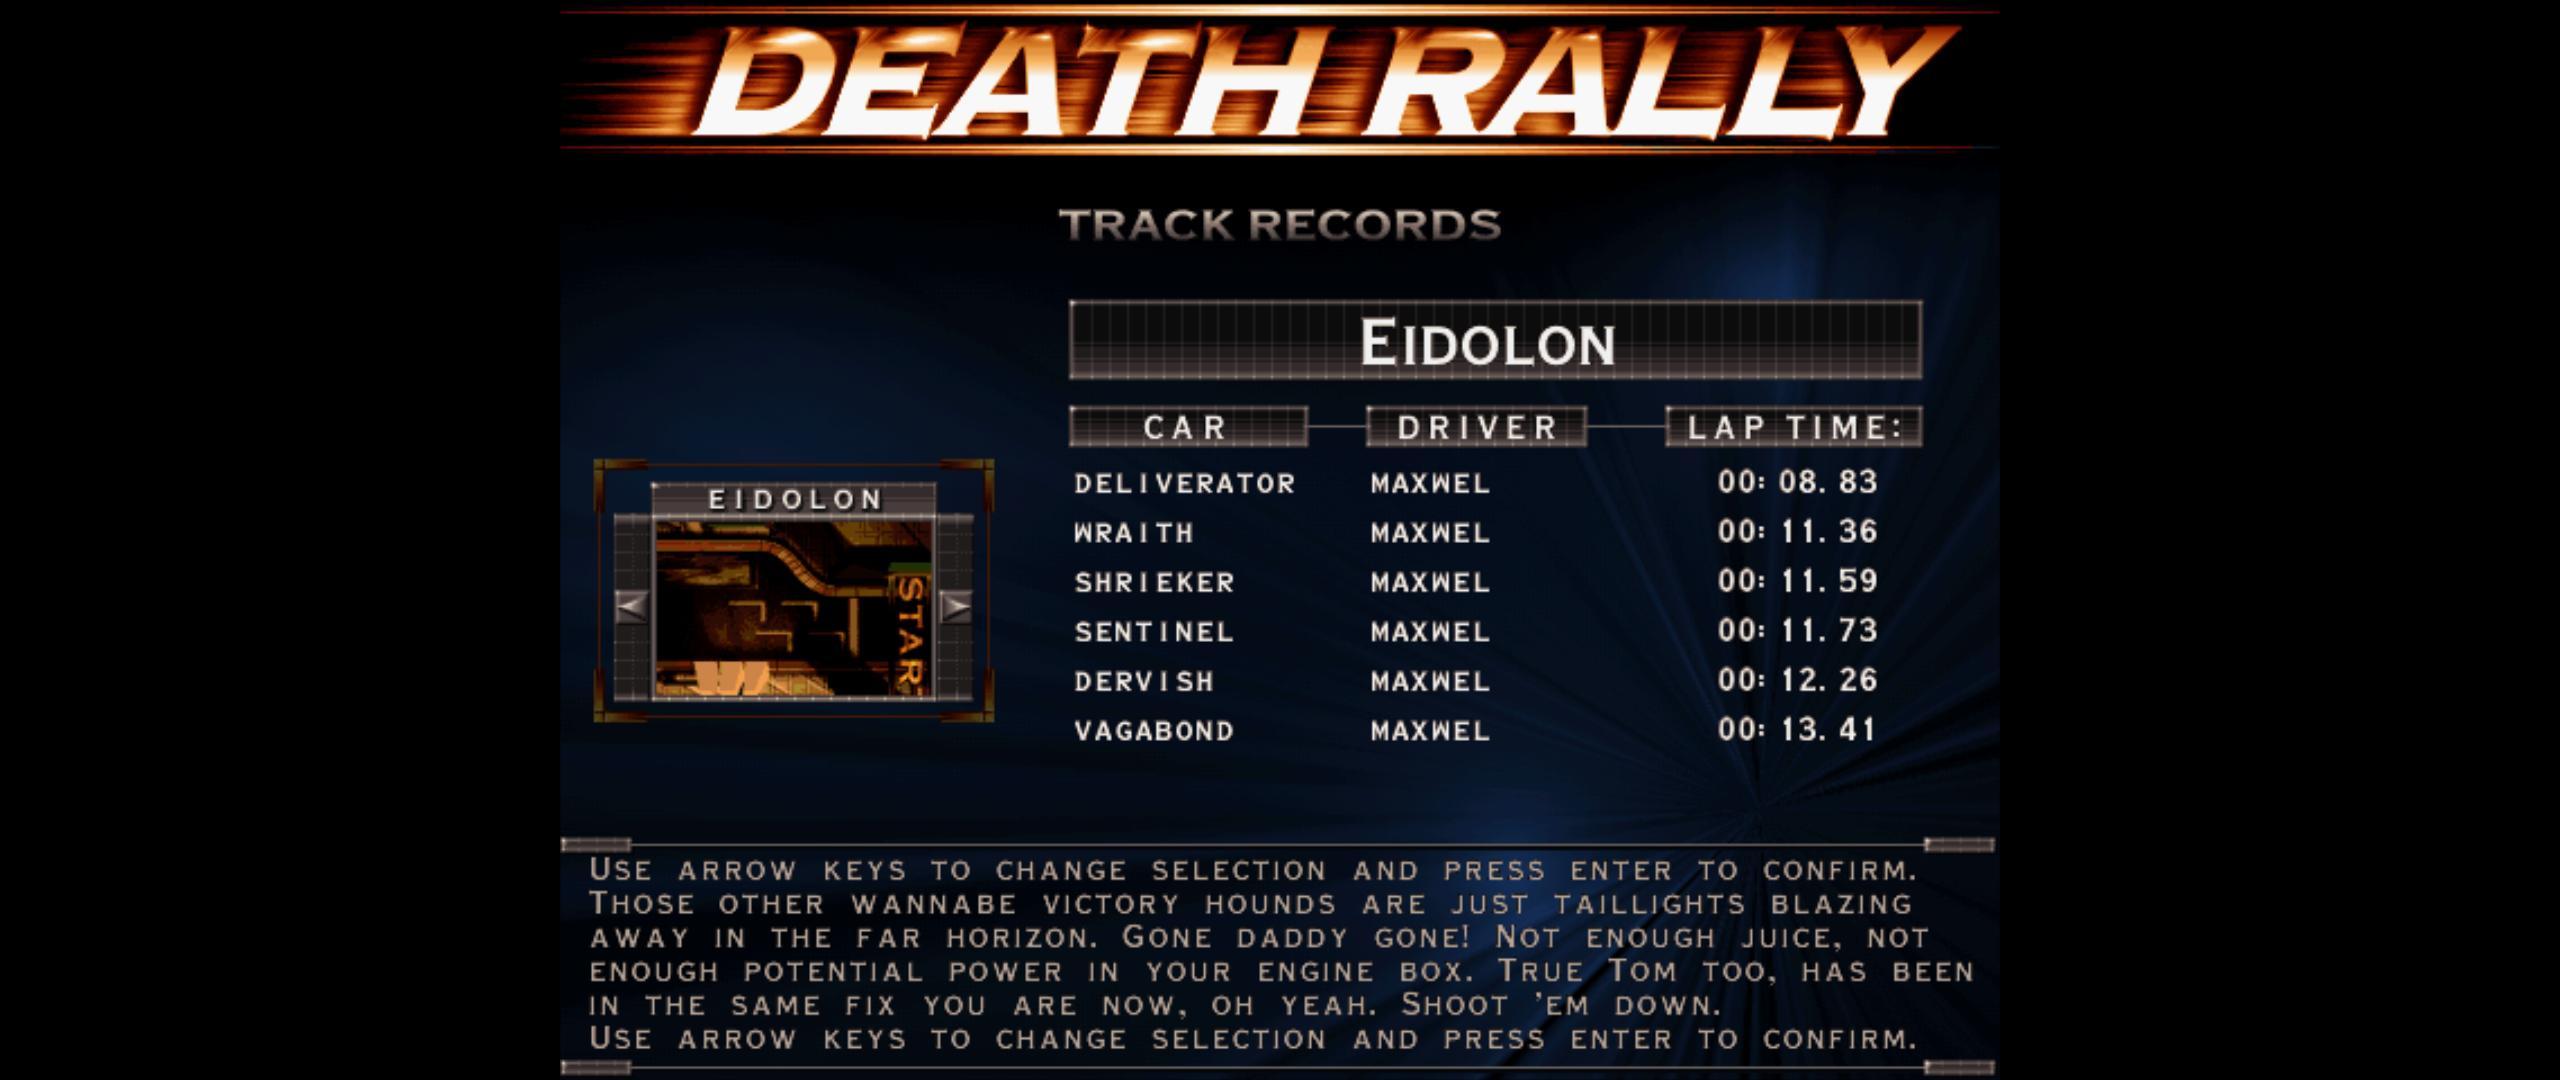 Maxwel: Death Rally [Eidolon, Shrieker Car] (PC) 0:00:11.59 points on 2016-03-04 08:12:01